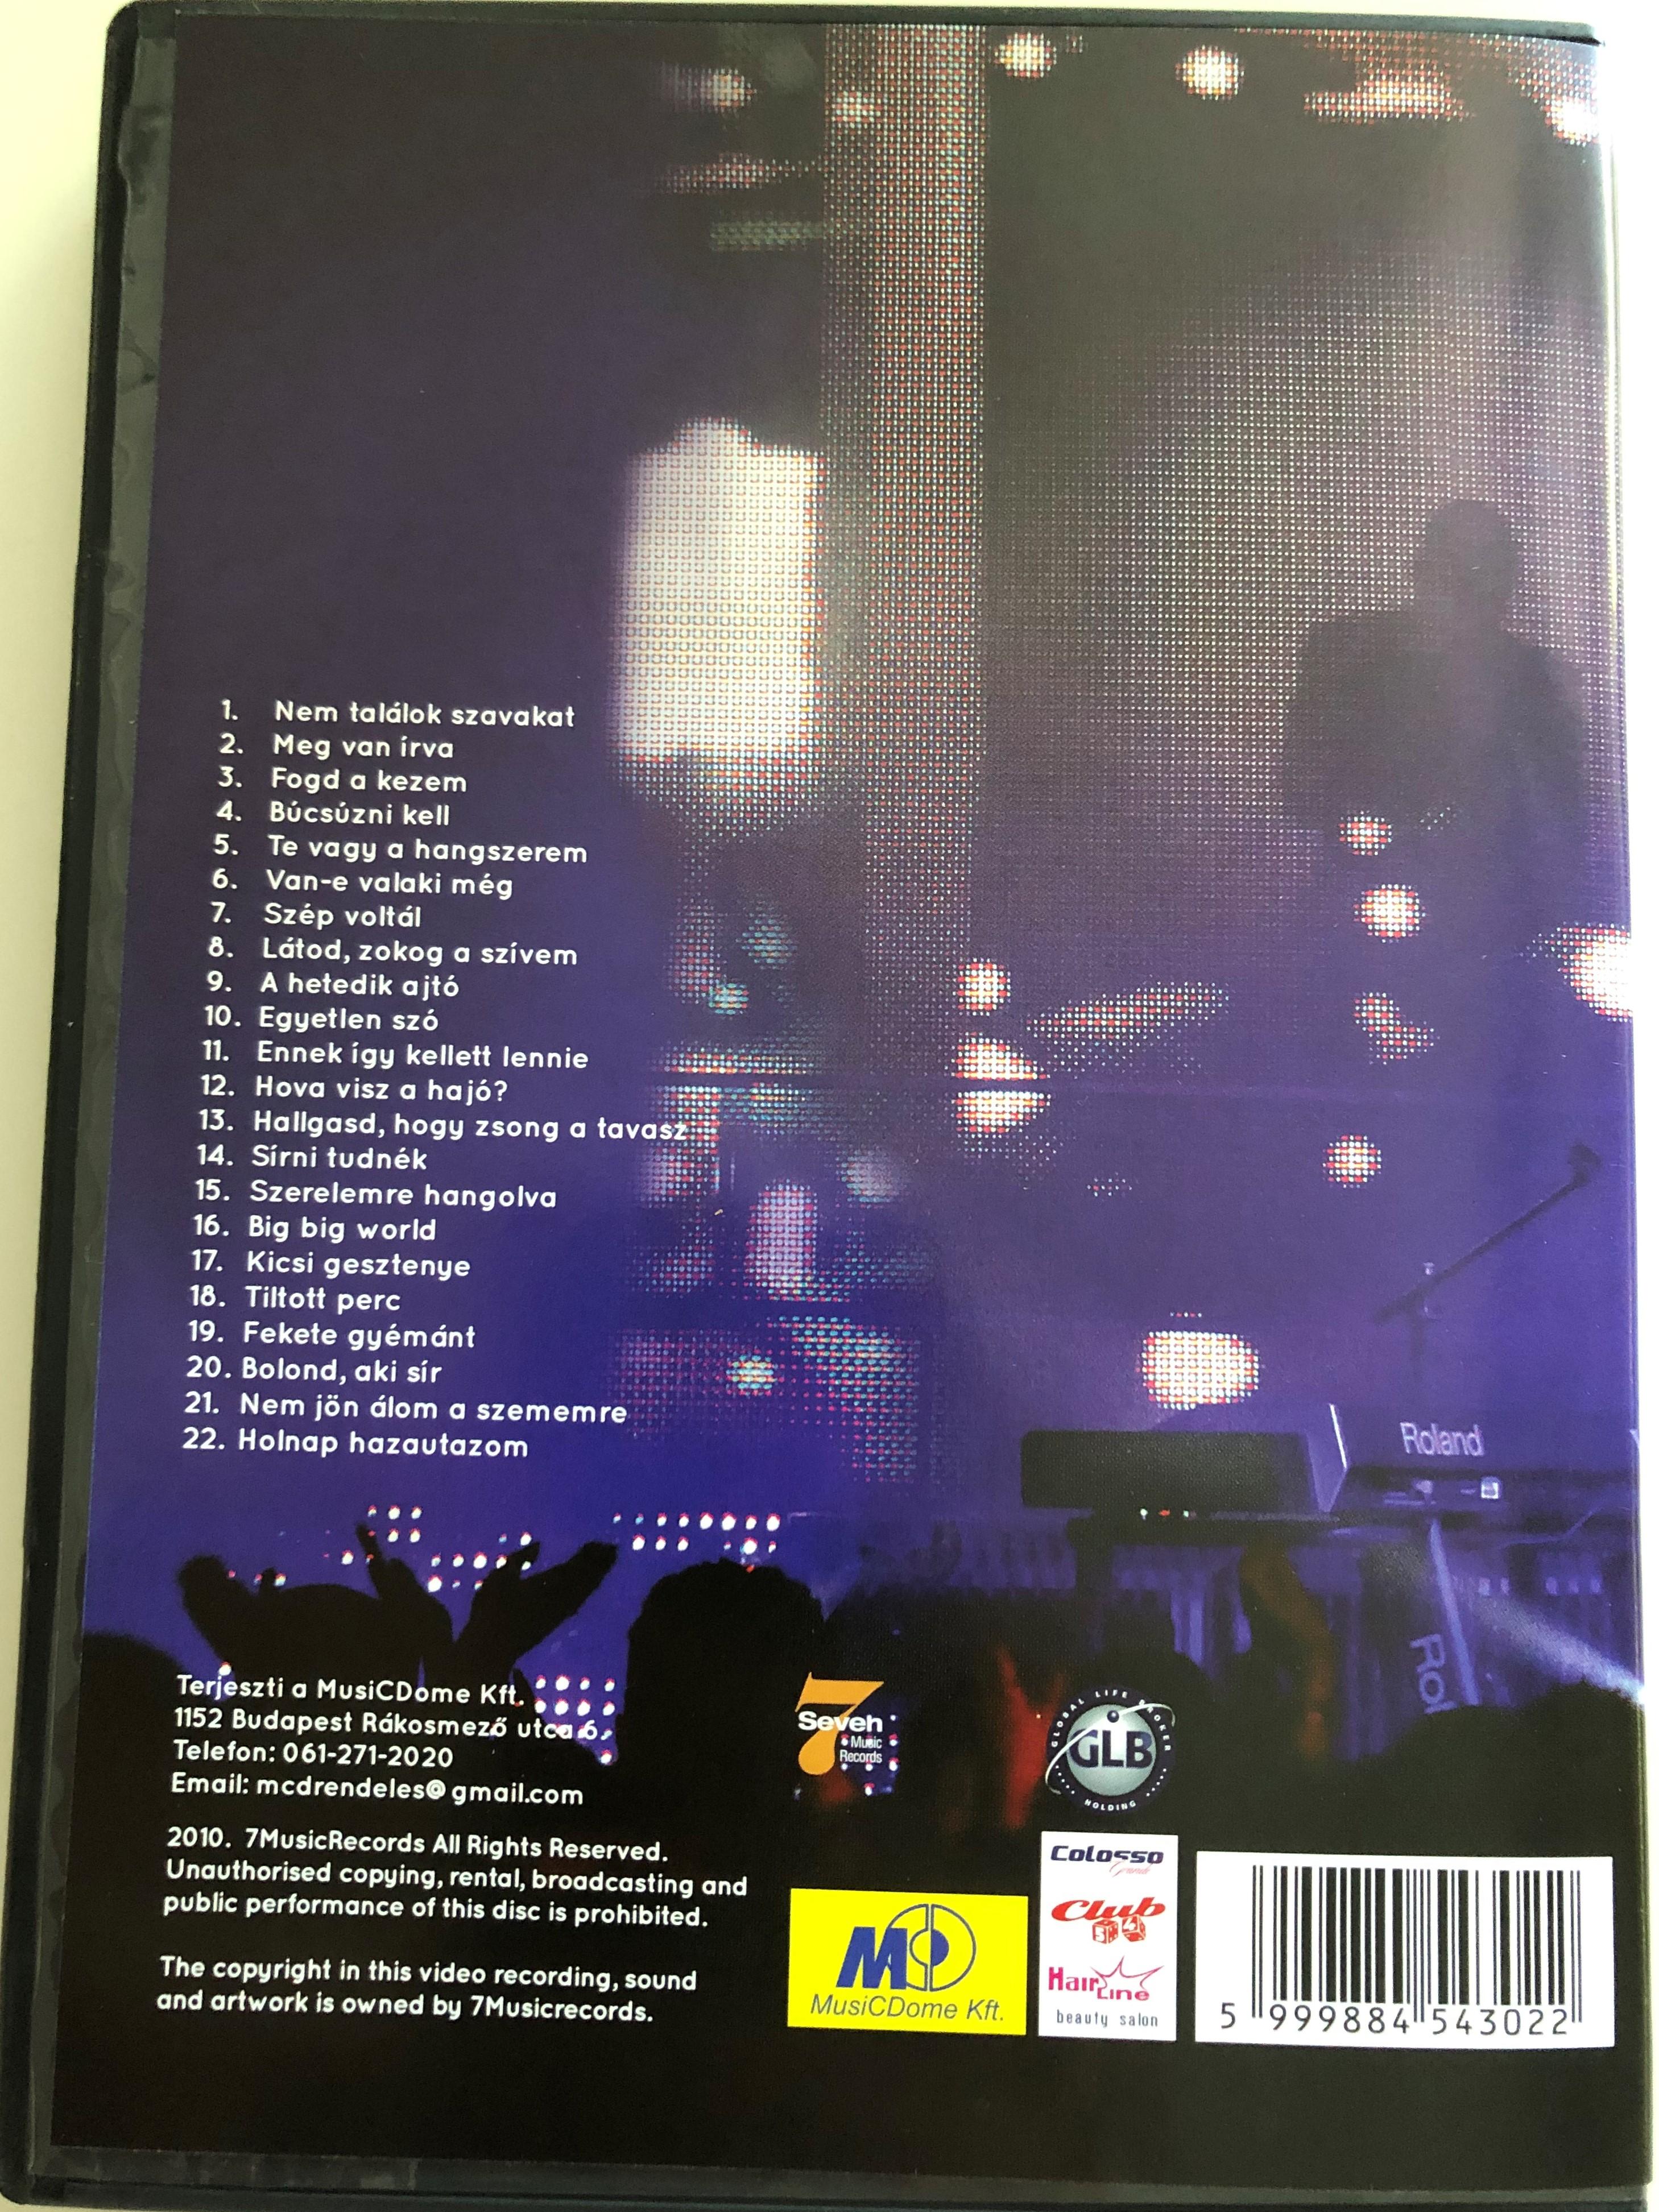 dobr-dy-kos-k-zelebb-egym-shoz-dvd-2010-directed-by-veres-zsolt-2009-live-concert-recording-smr-2010-musicdome-4-.jpg